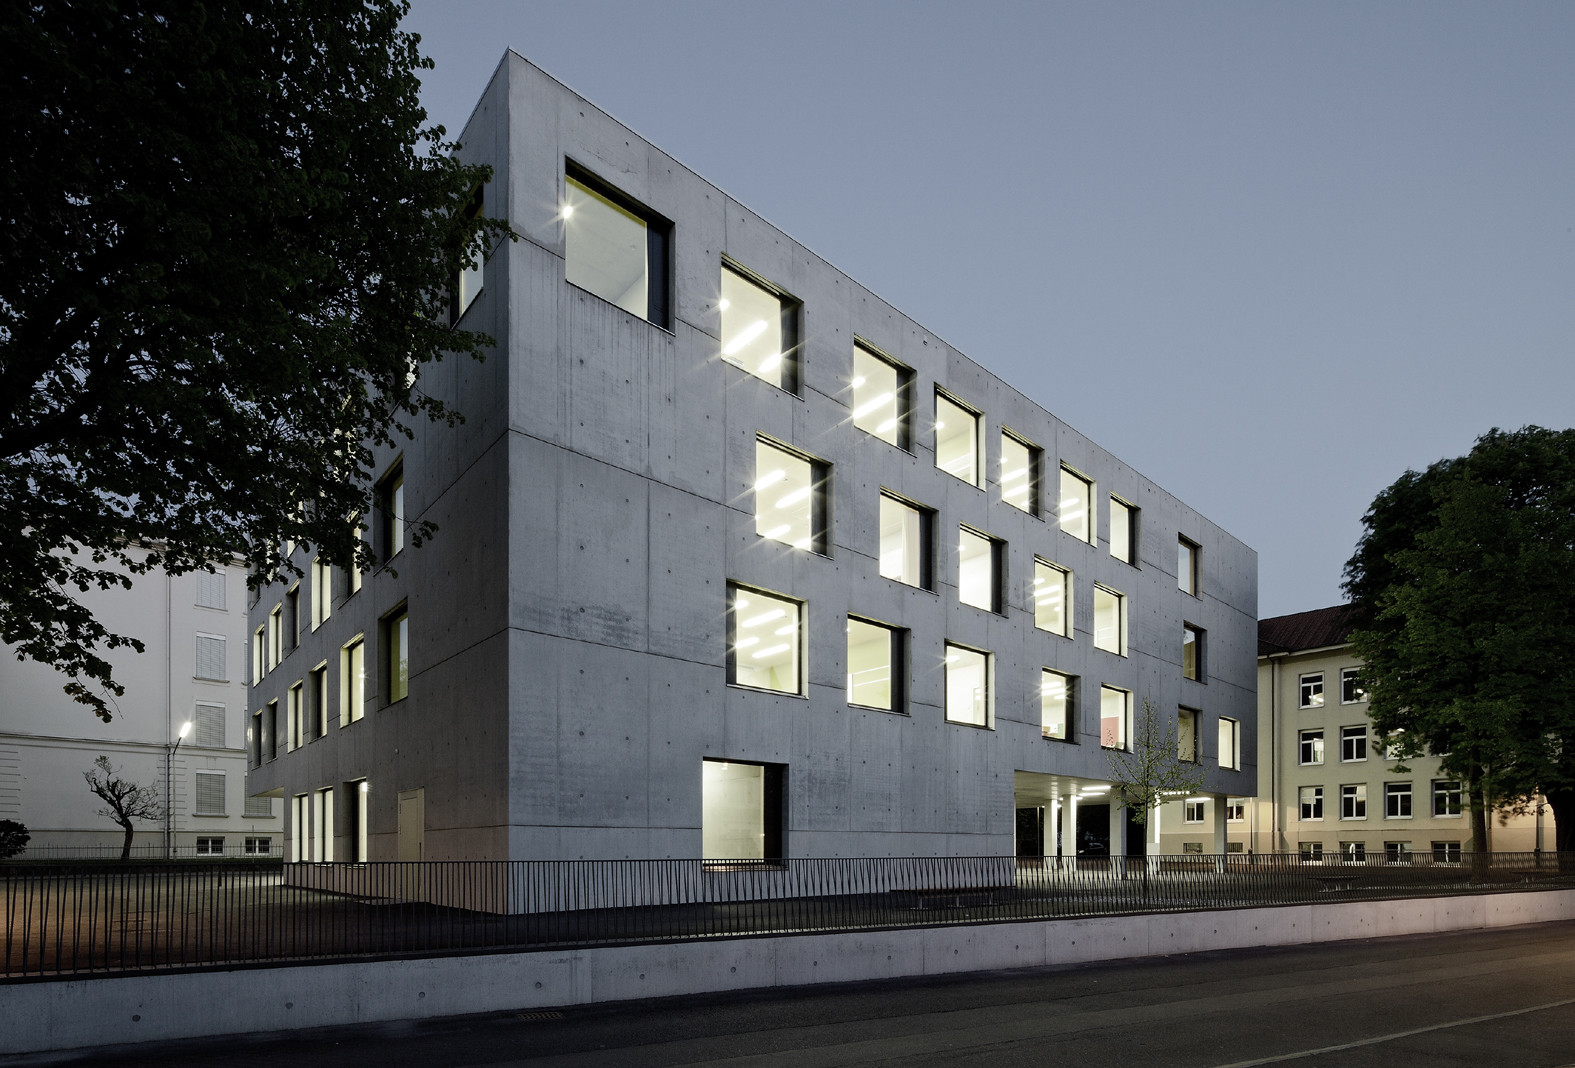 Special Education Centre in Dornbirn / Marte Marte Architekten, Courtesy of Marte Marte Architekten